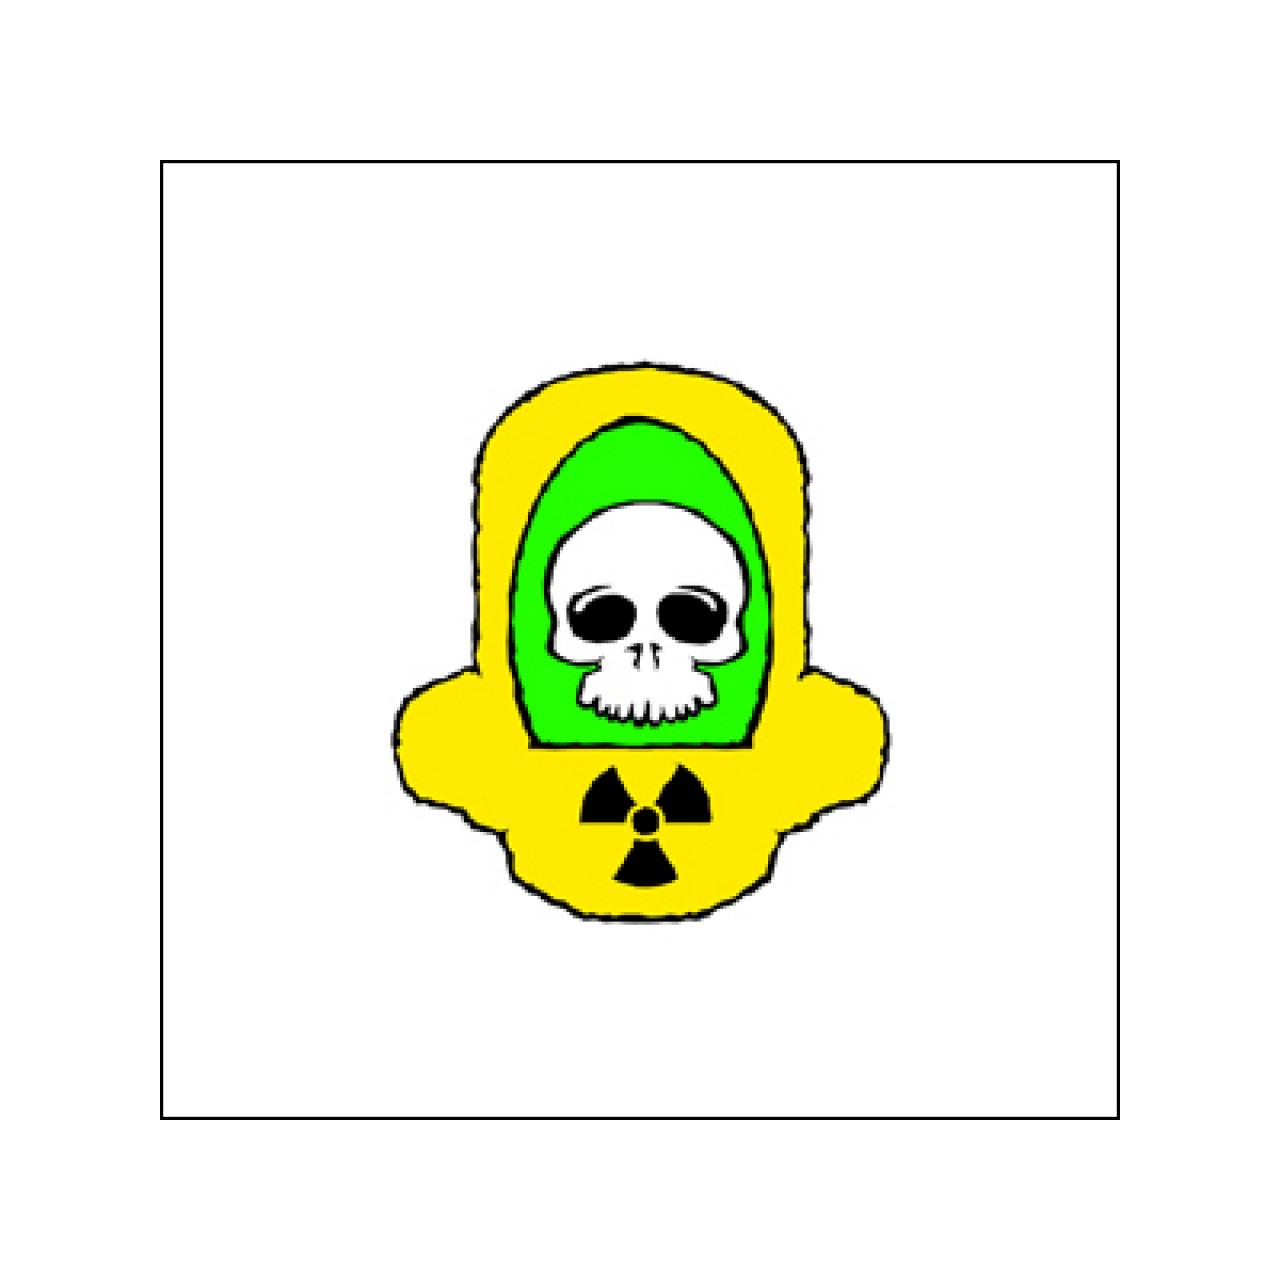 PlutoniumPowered